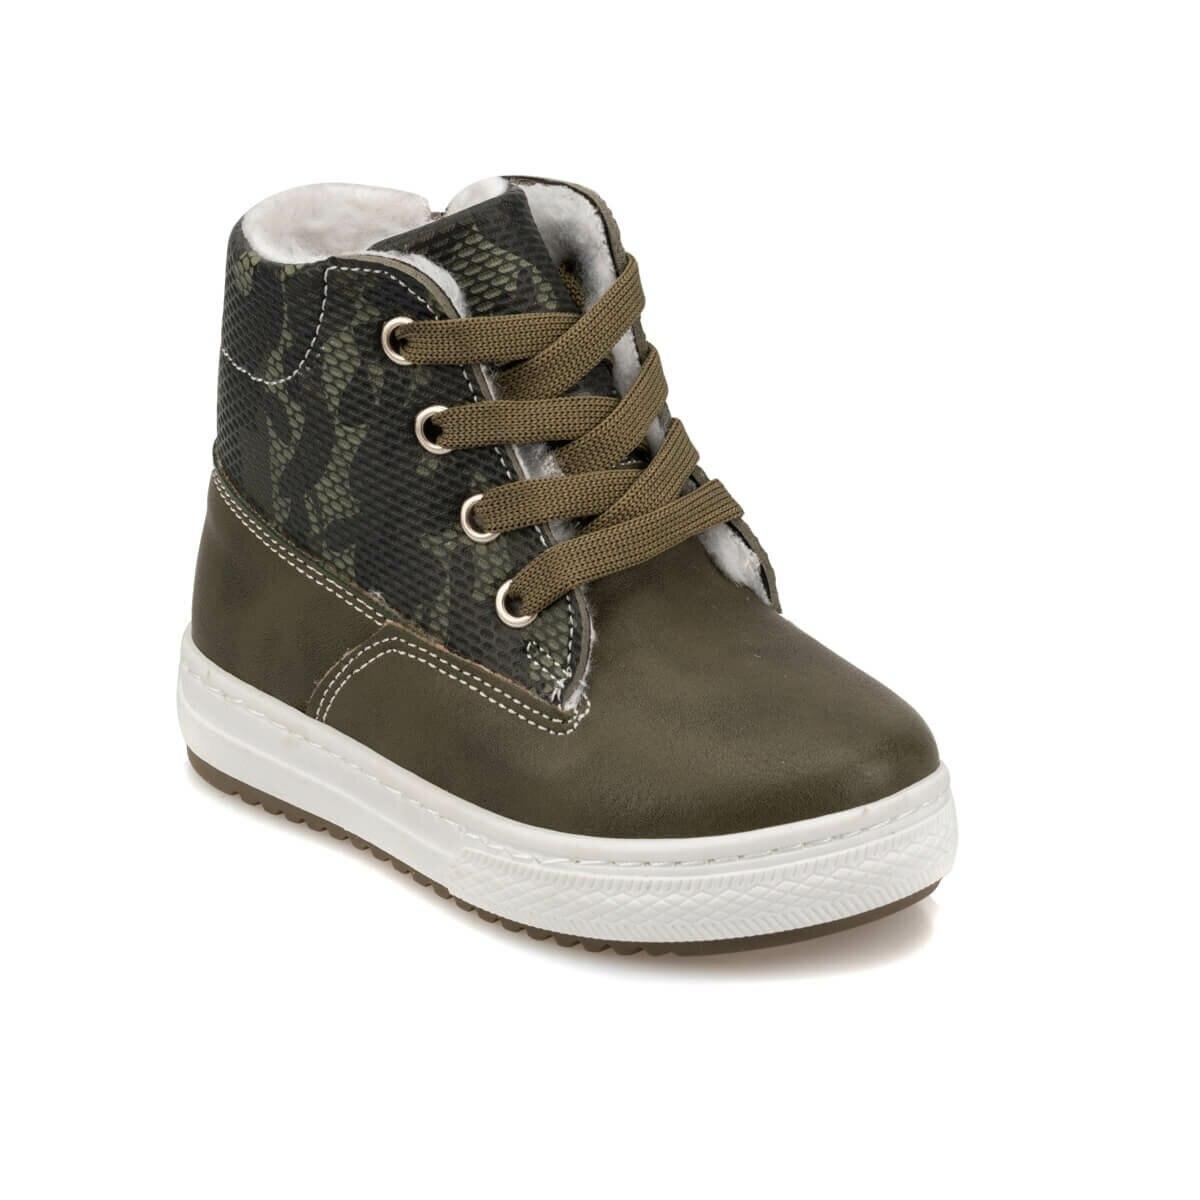 FLO 92.511729.B Khaki Male Child Sneaker Shoes Polaris